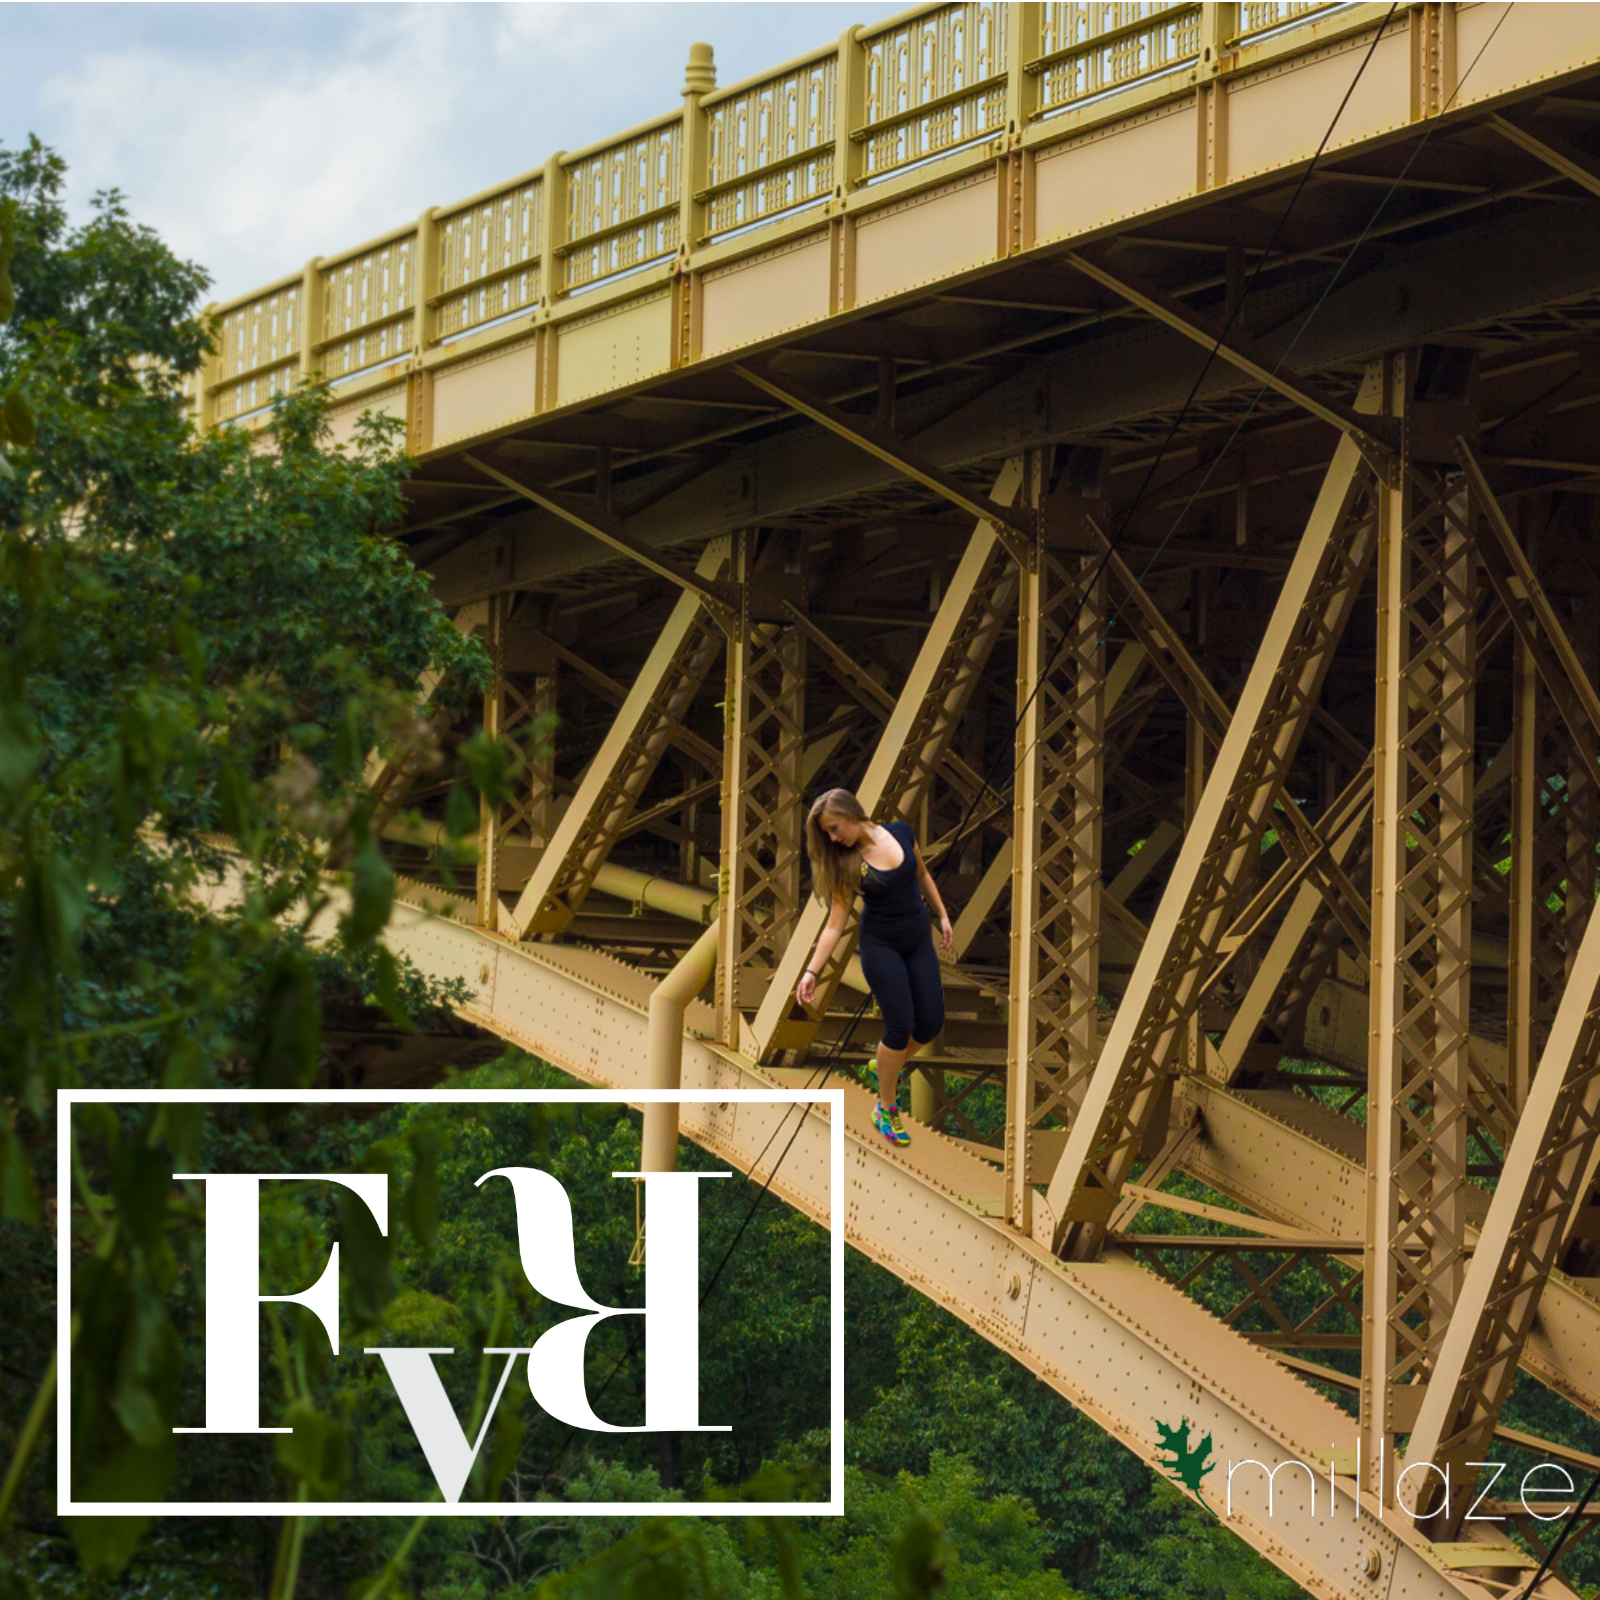 Millaze Book 1, The Malaise: FvR: Falling vs. Rising